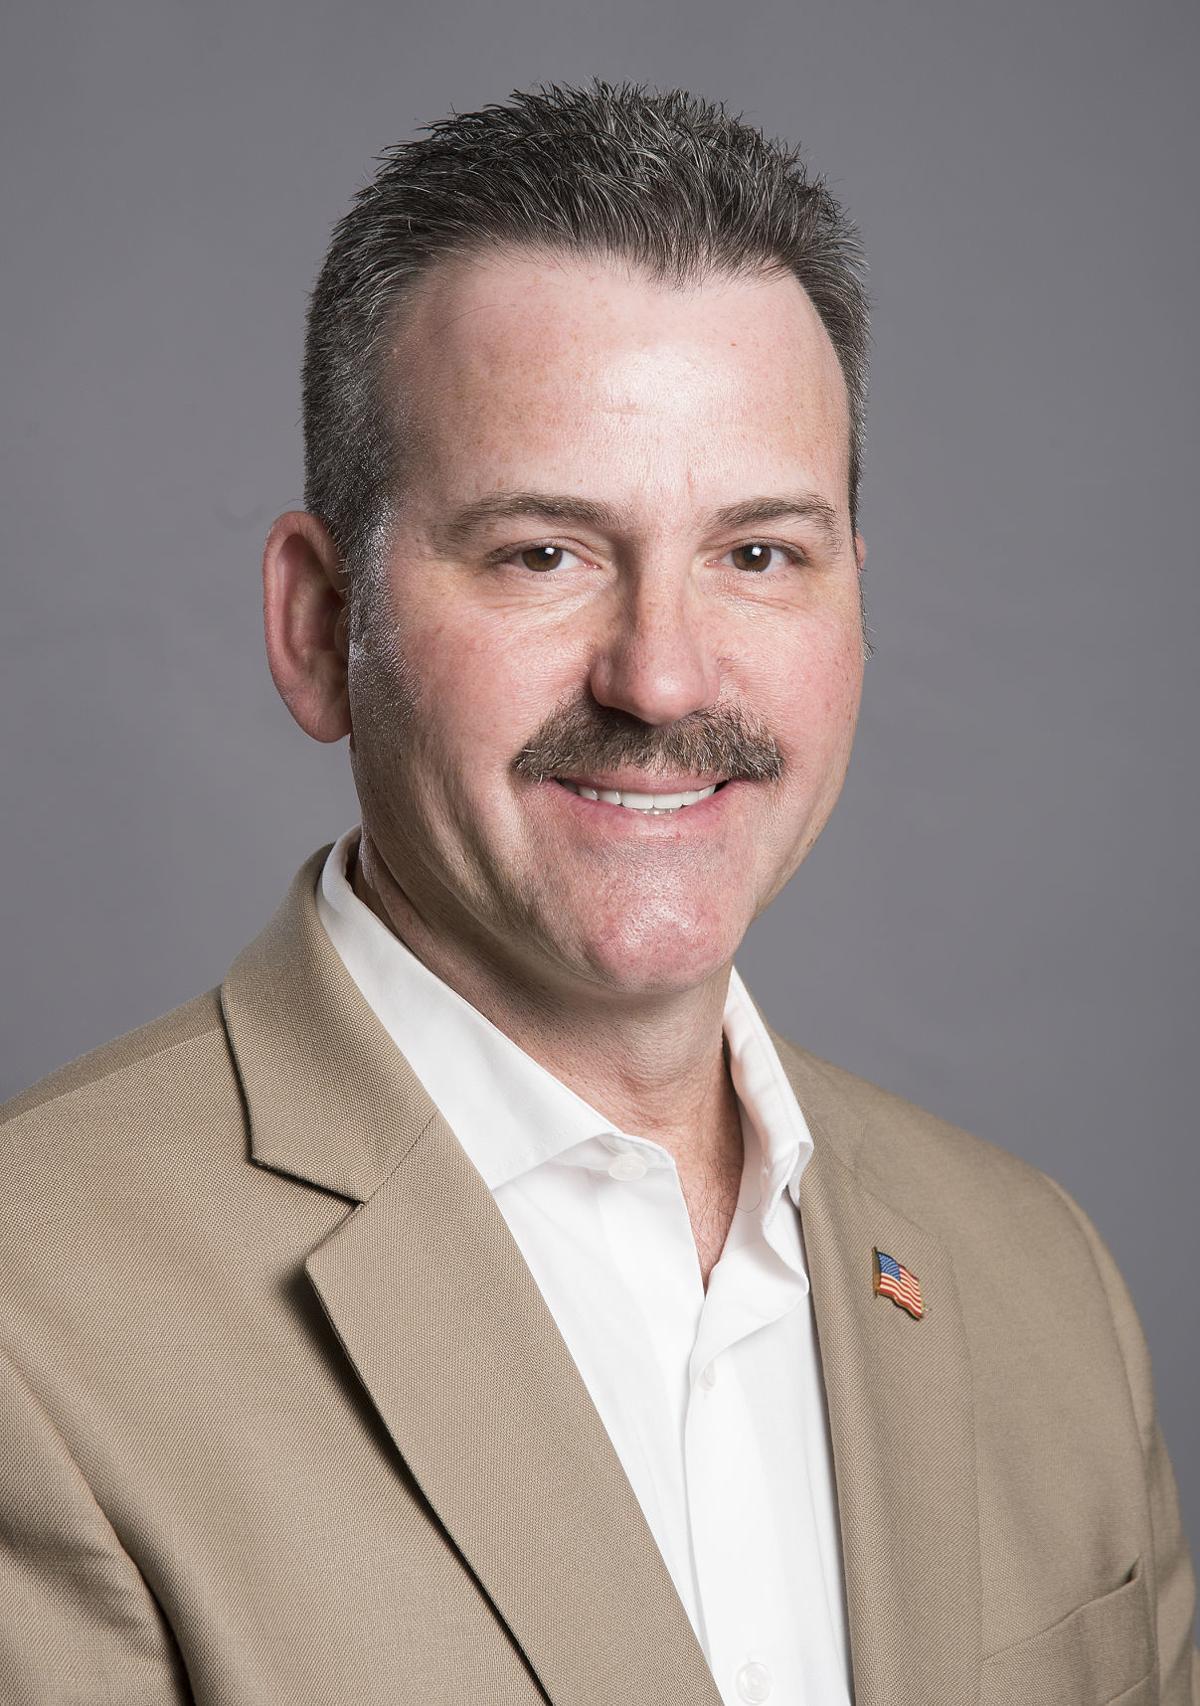 DG Candidate Jimmy Trout